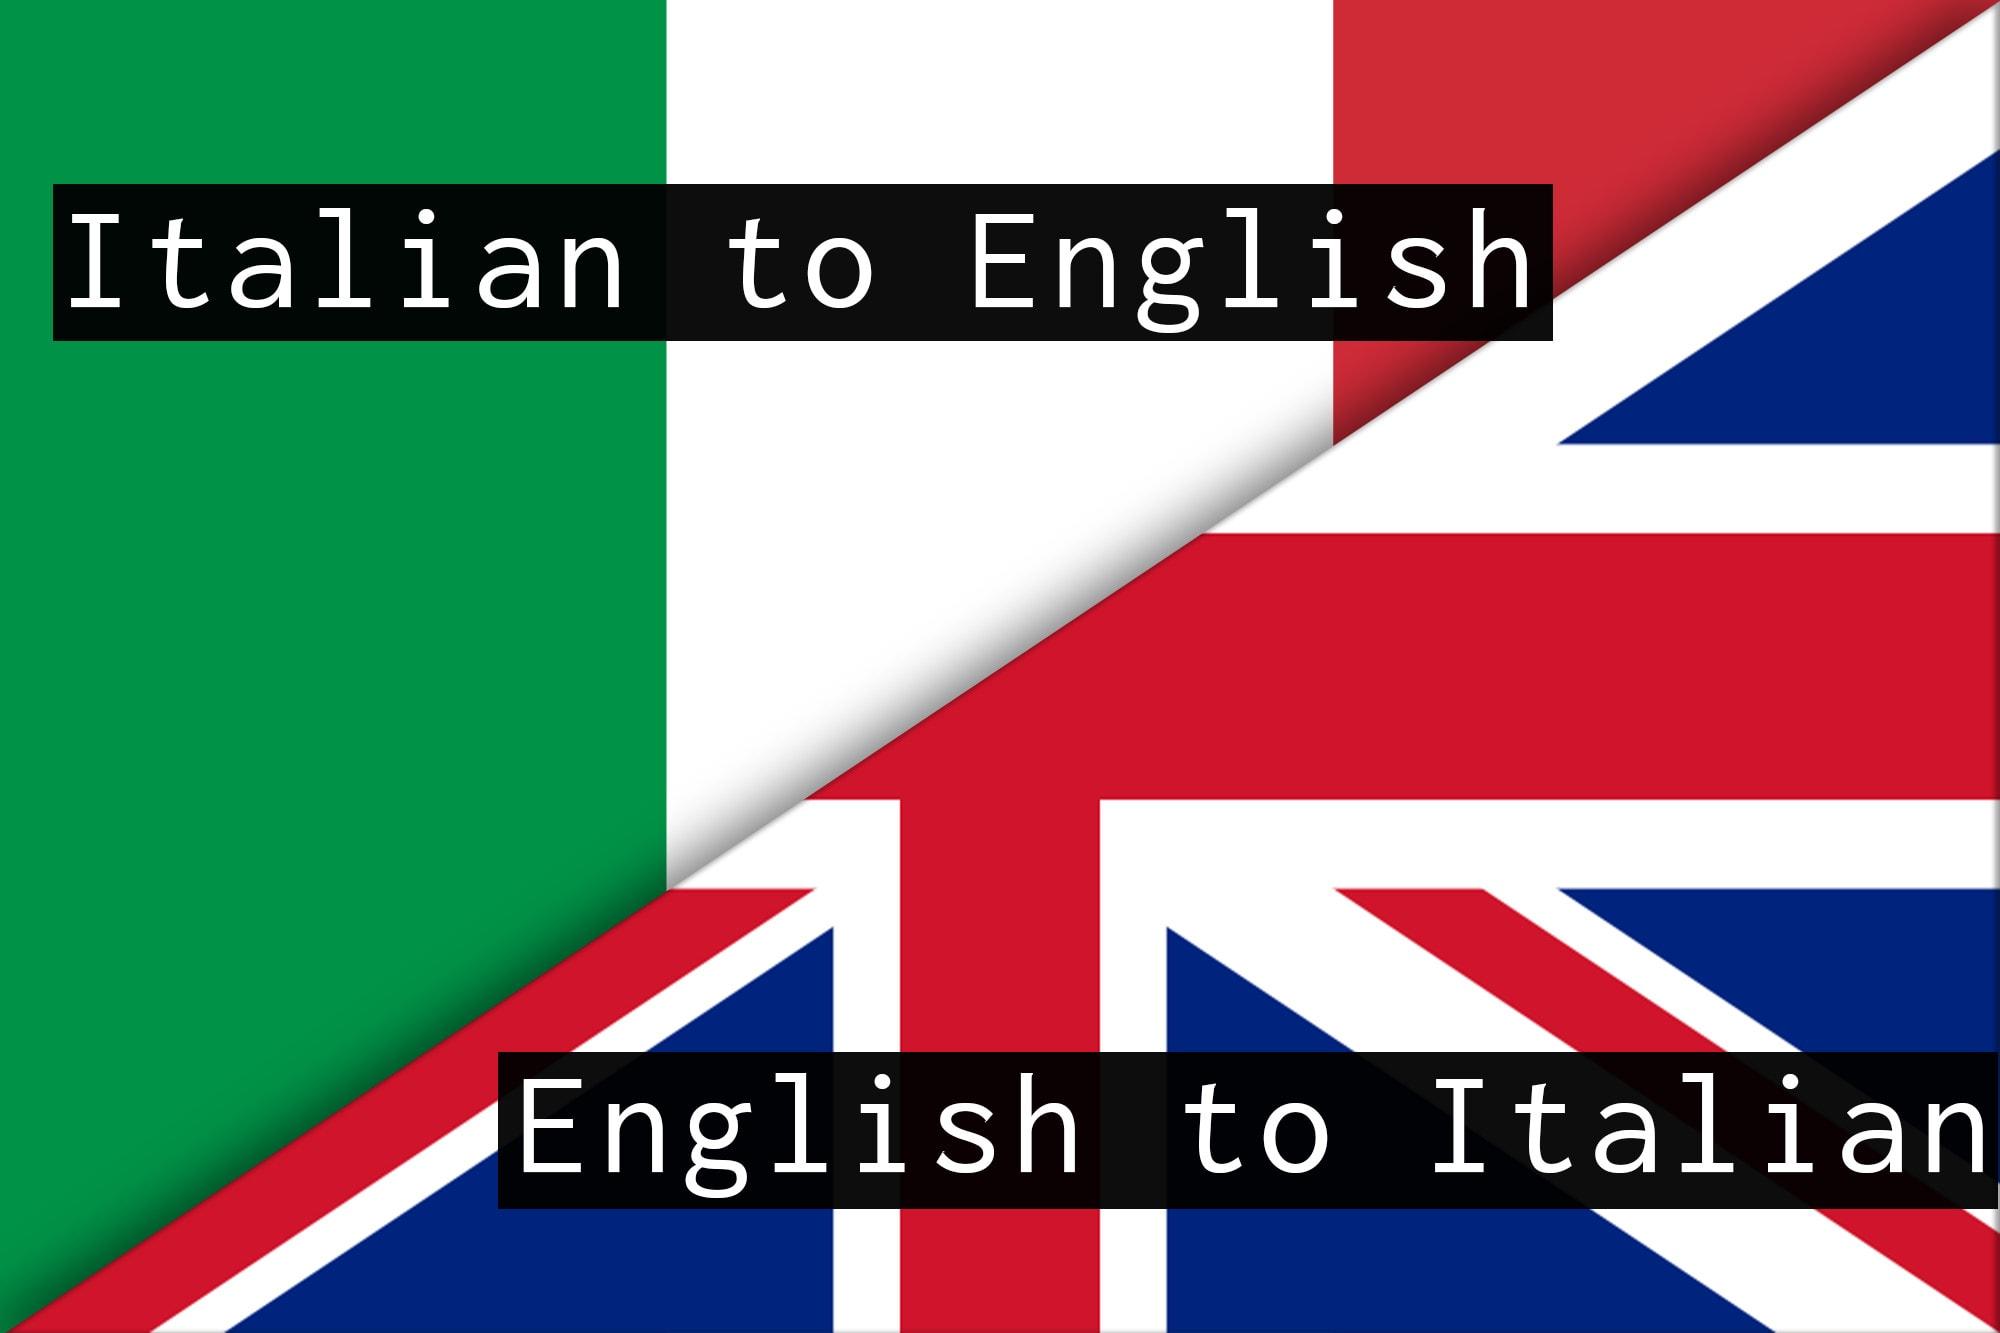 Translate italian to english or english to italian by Pineapple_graph